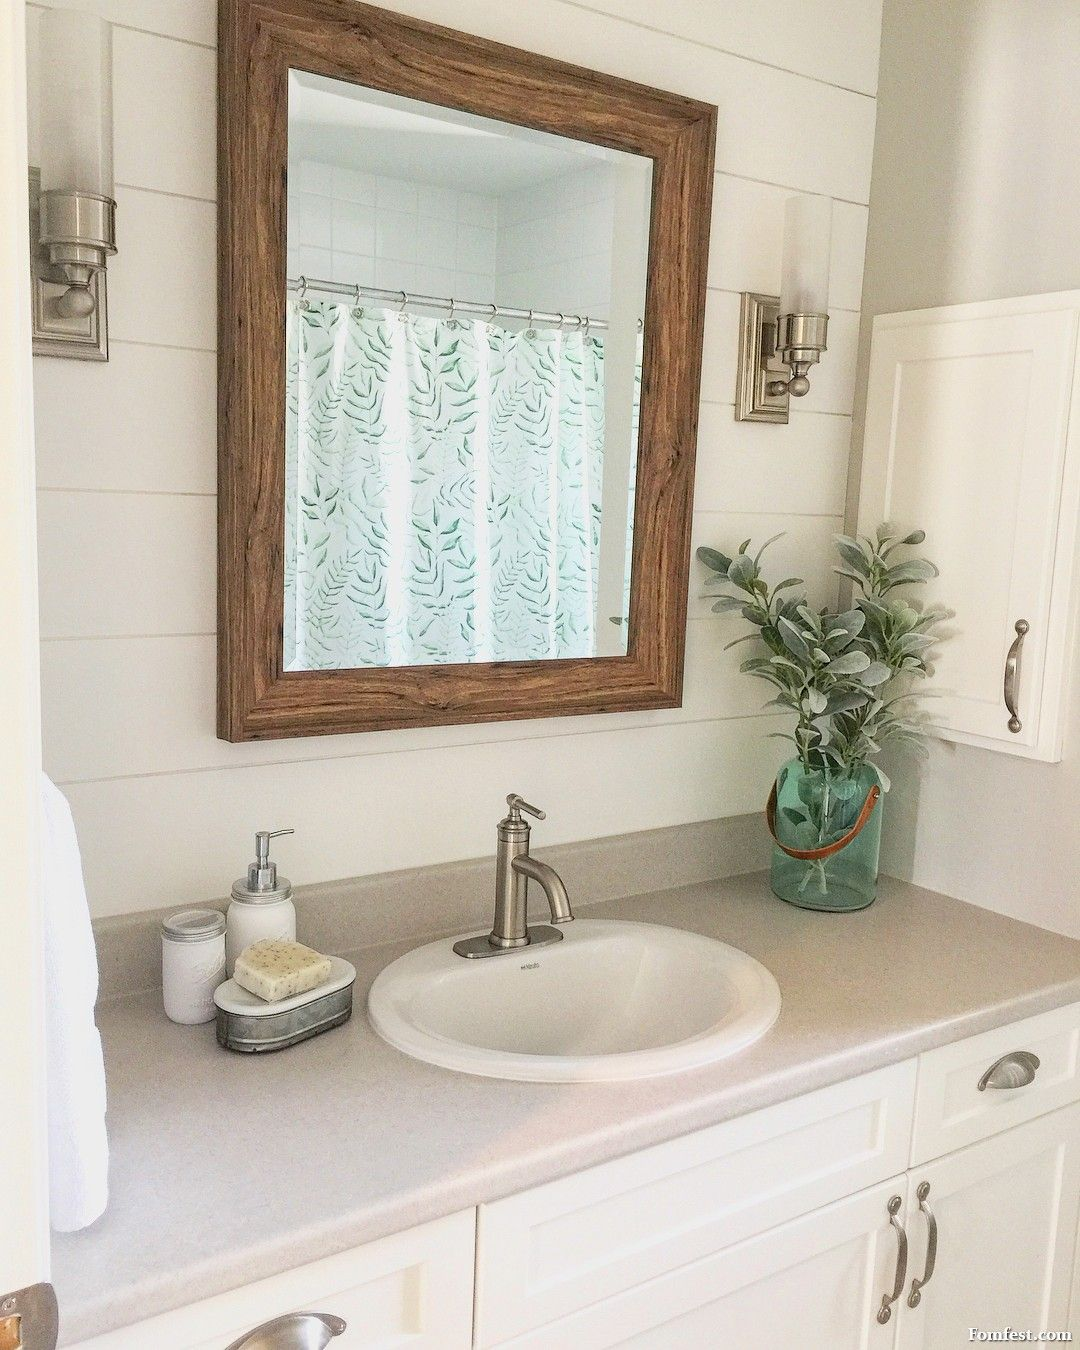 poplar shiplap boards   HOUSE   Shiplap boards, Bathroom